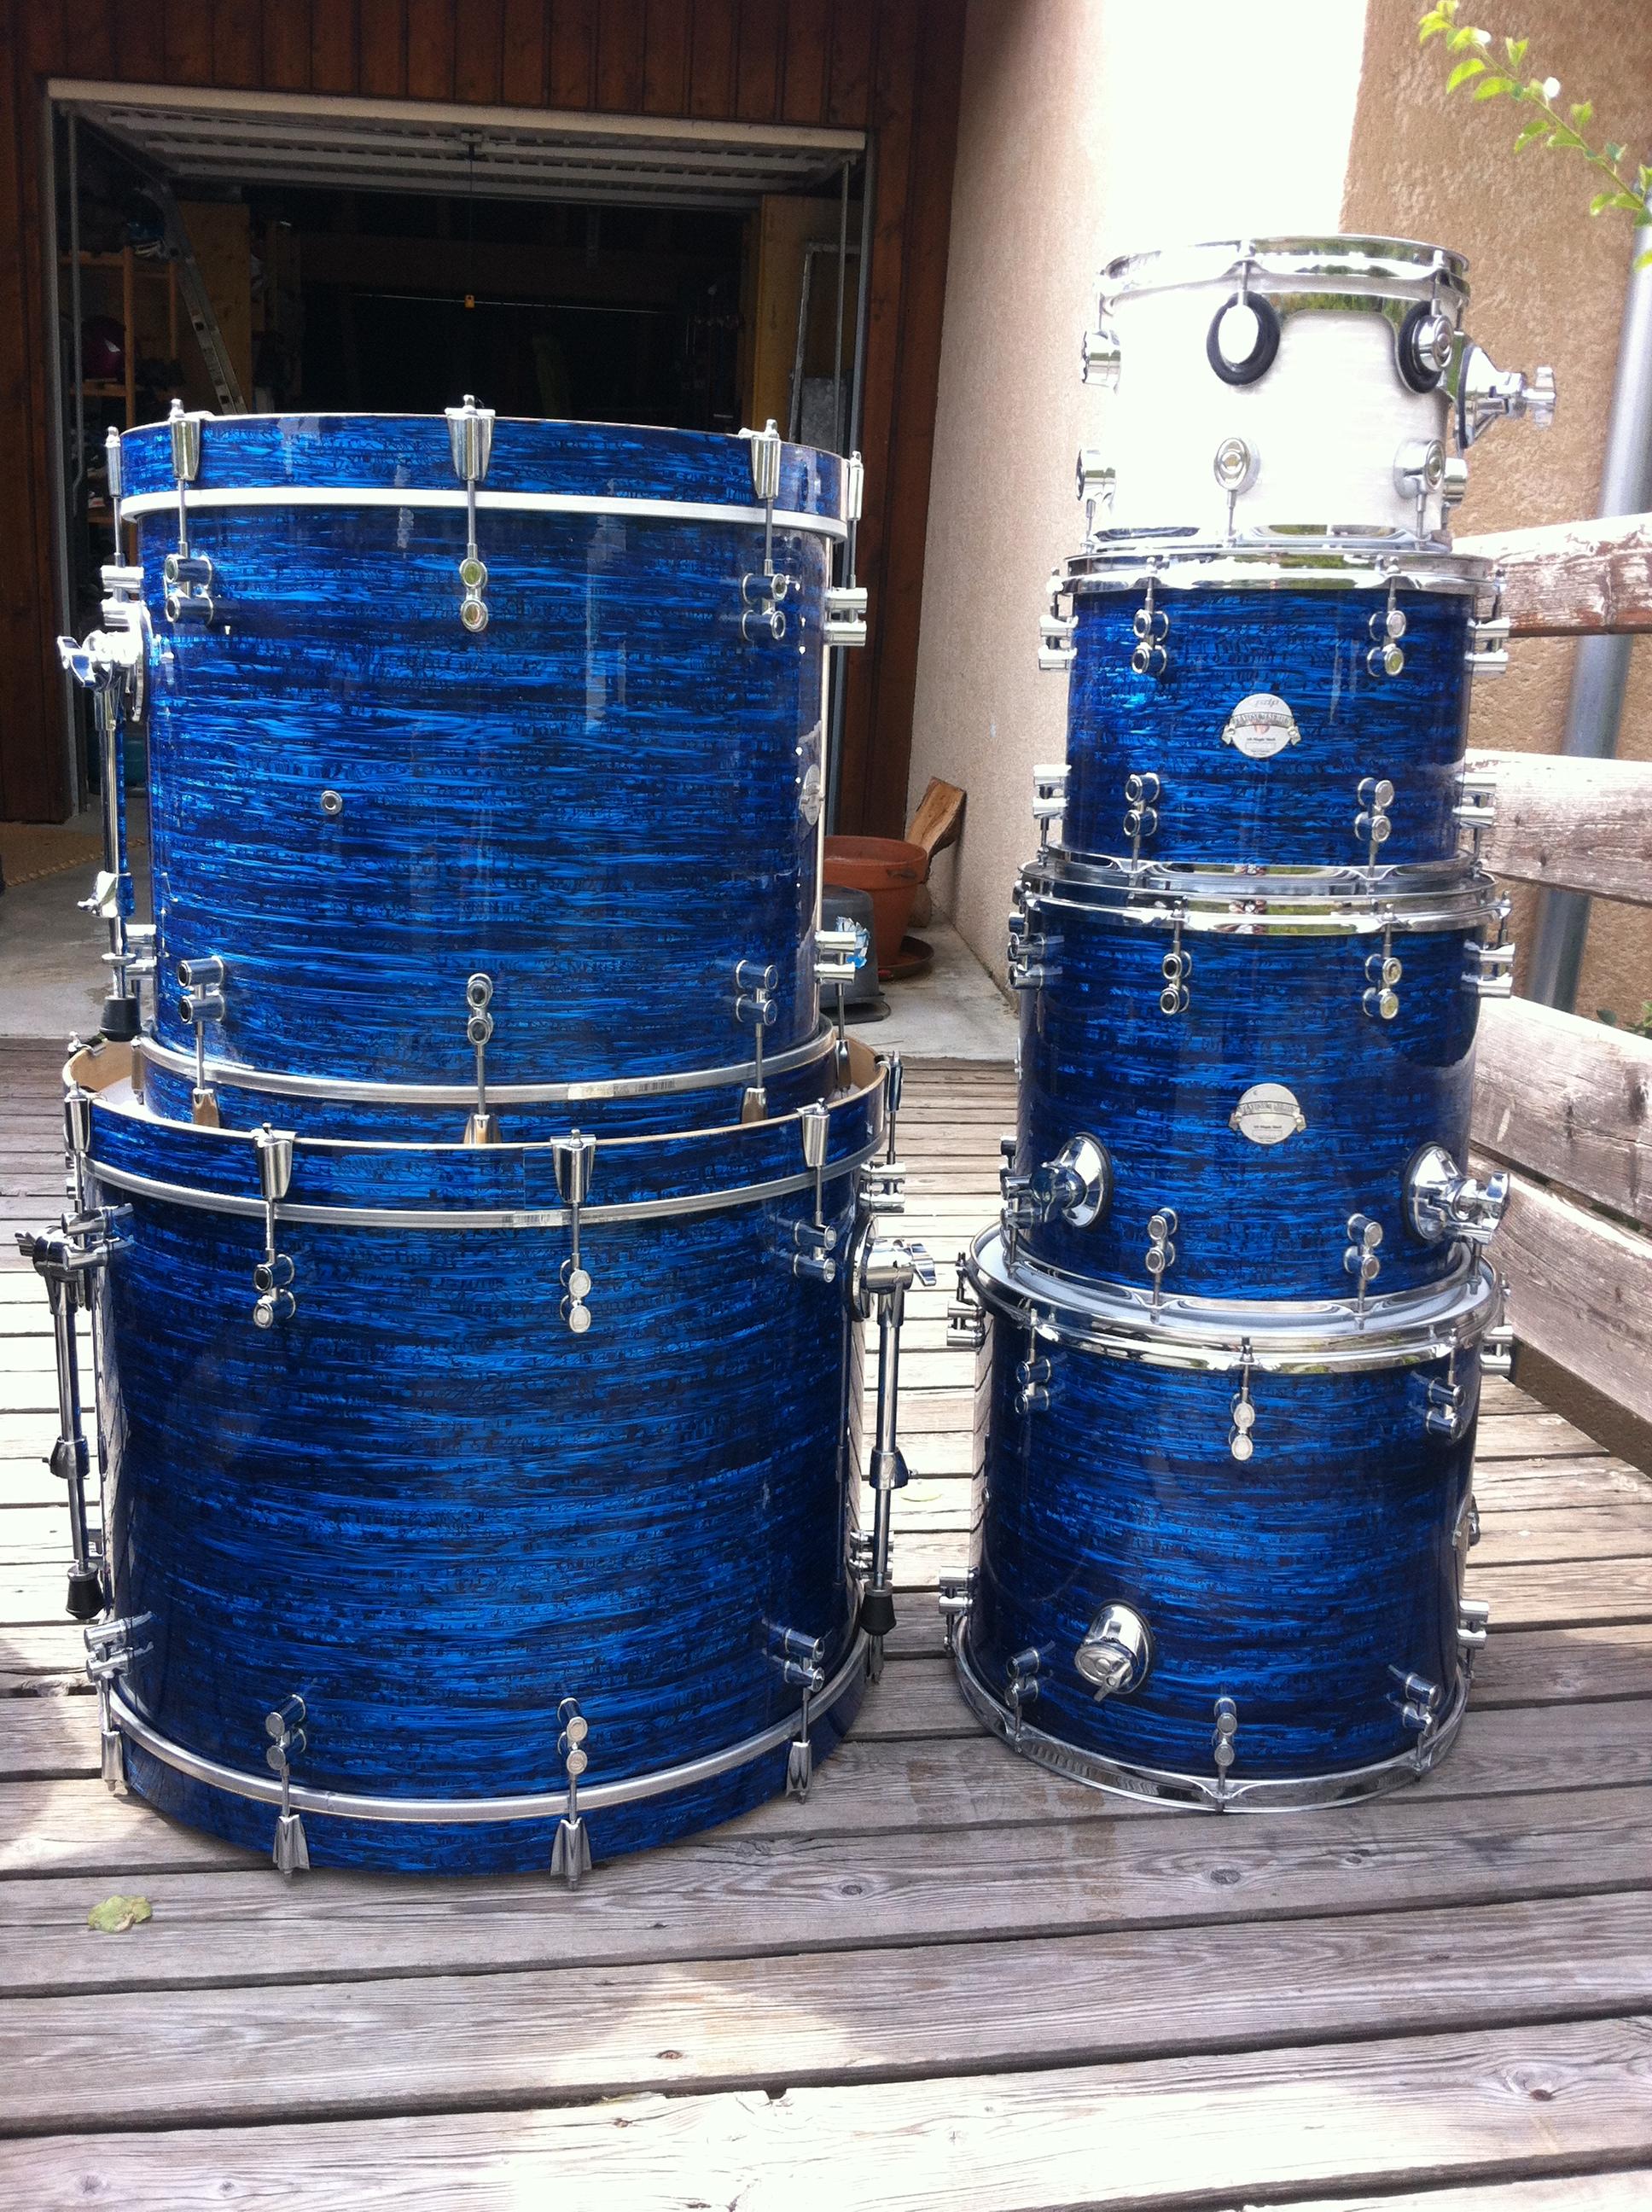 pdp platinum pdp pacific drums and percussion pdp platinum audiofanzine. Black Bedroom Furniture Sets. Home Design Ideas